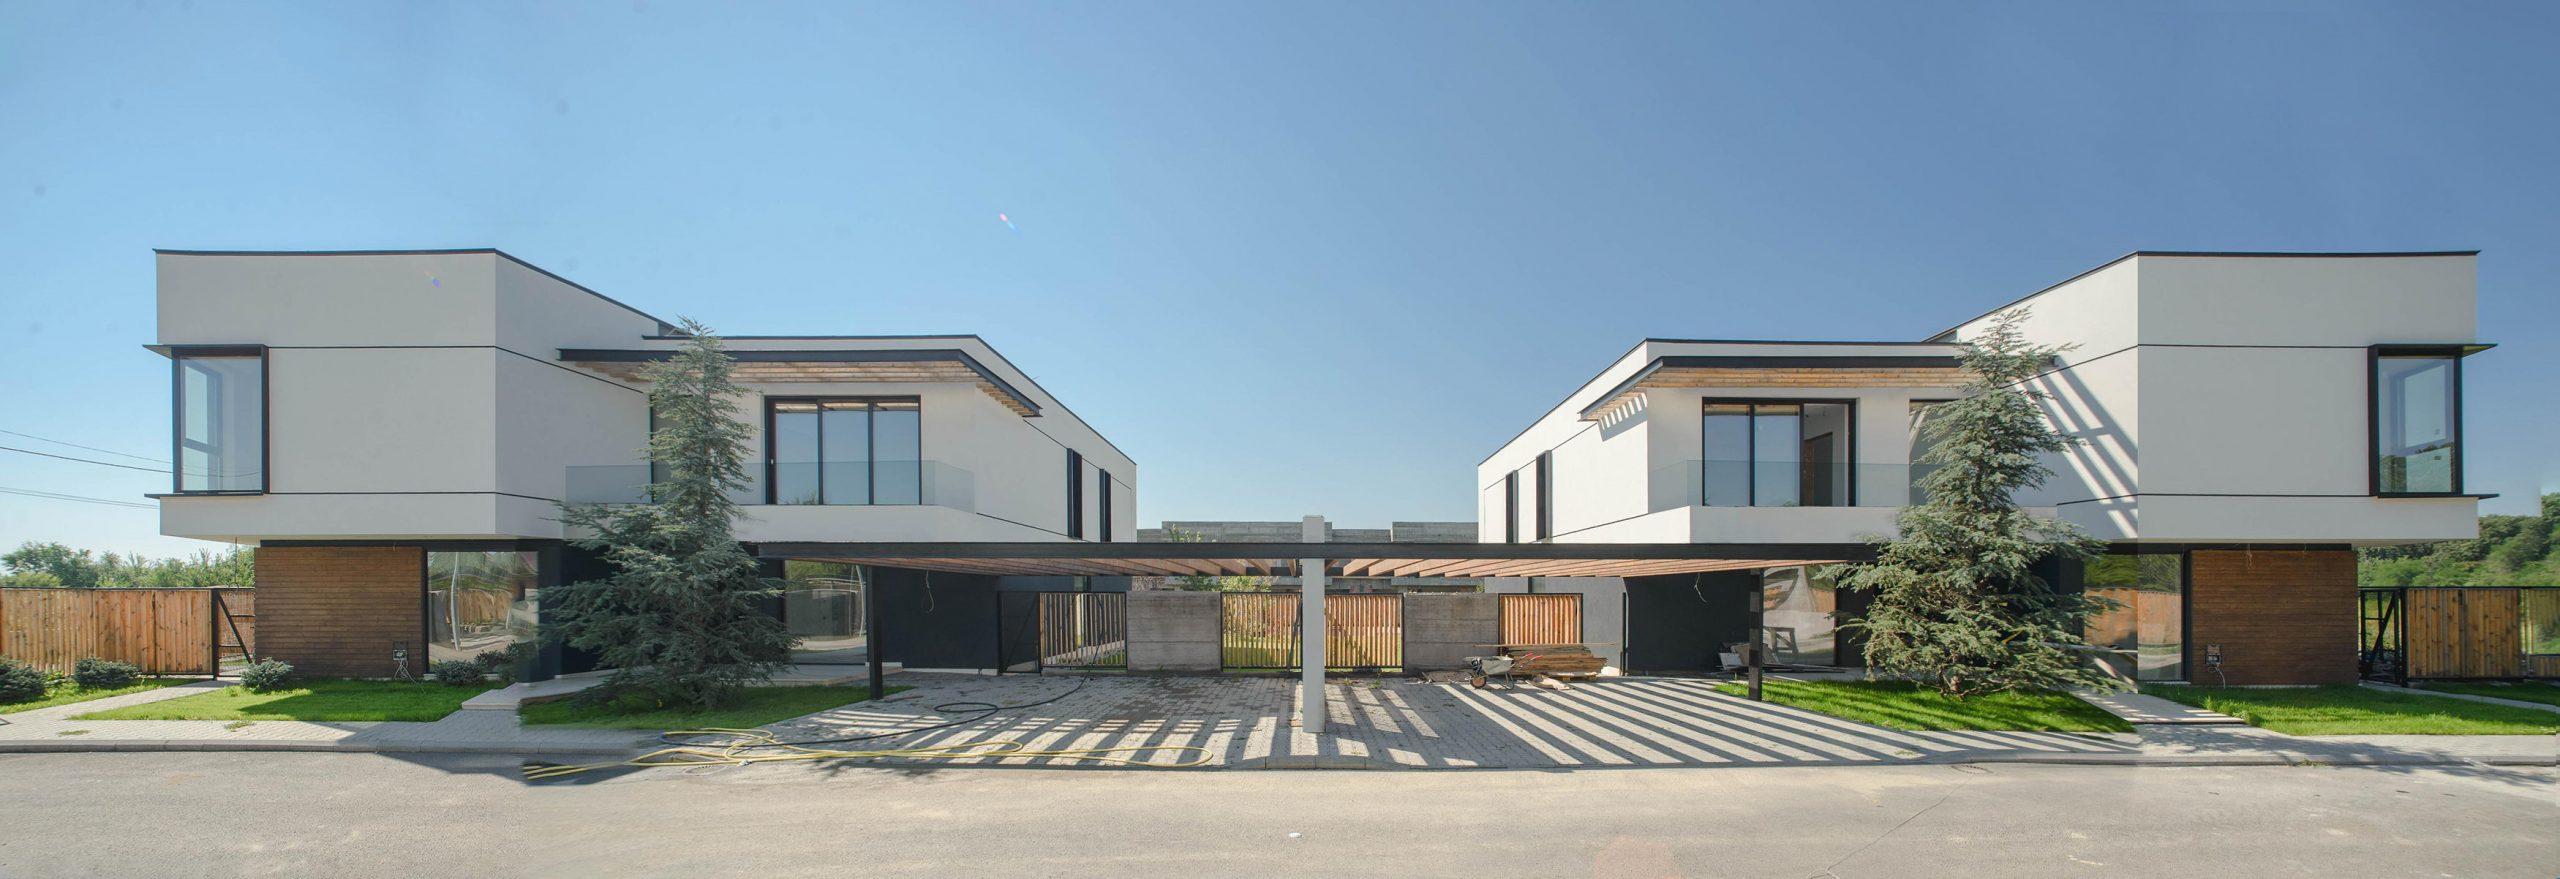 https://nbc-arhitect.ro/wp-content/uploads/2020/10/NBC-Arhitect-_-Arcstil_Residence-_-Romania-_-exterior-view-2-scaled.jpg